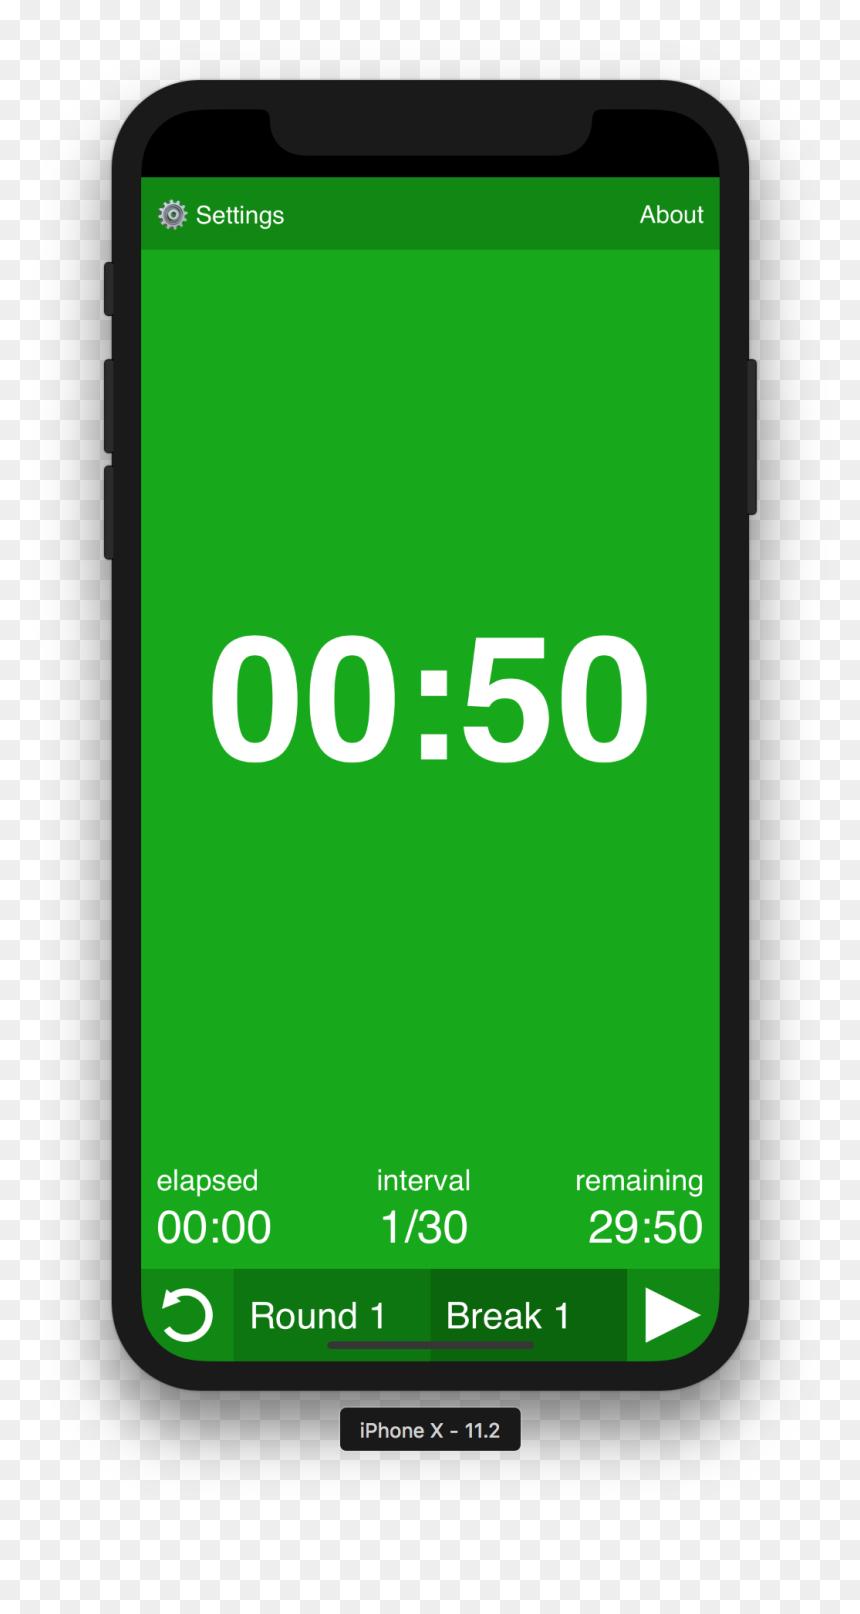 Iphone X Timer Png Transparent Png Vhv